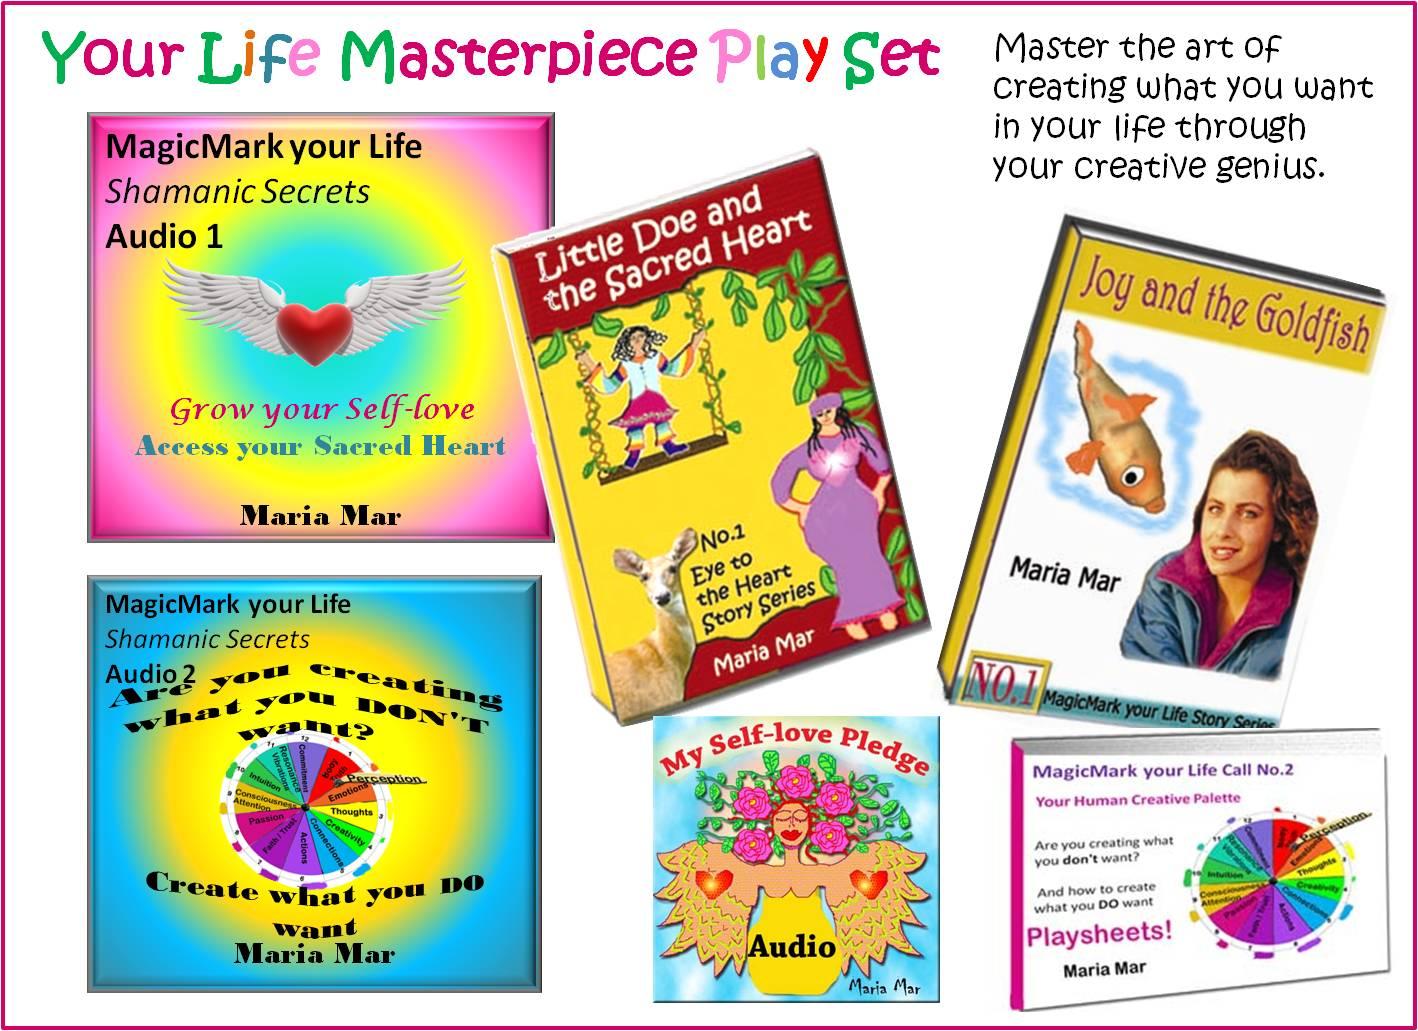 Life Masterpiece Play Set